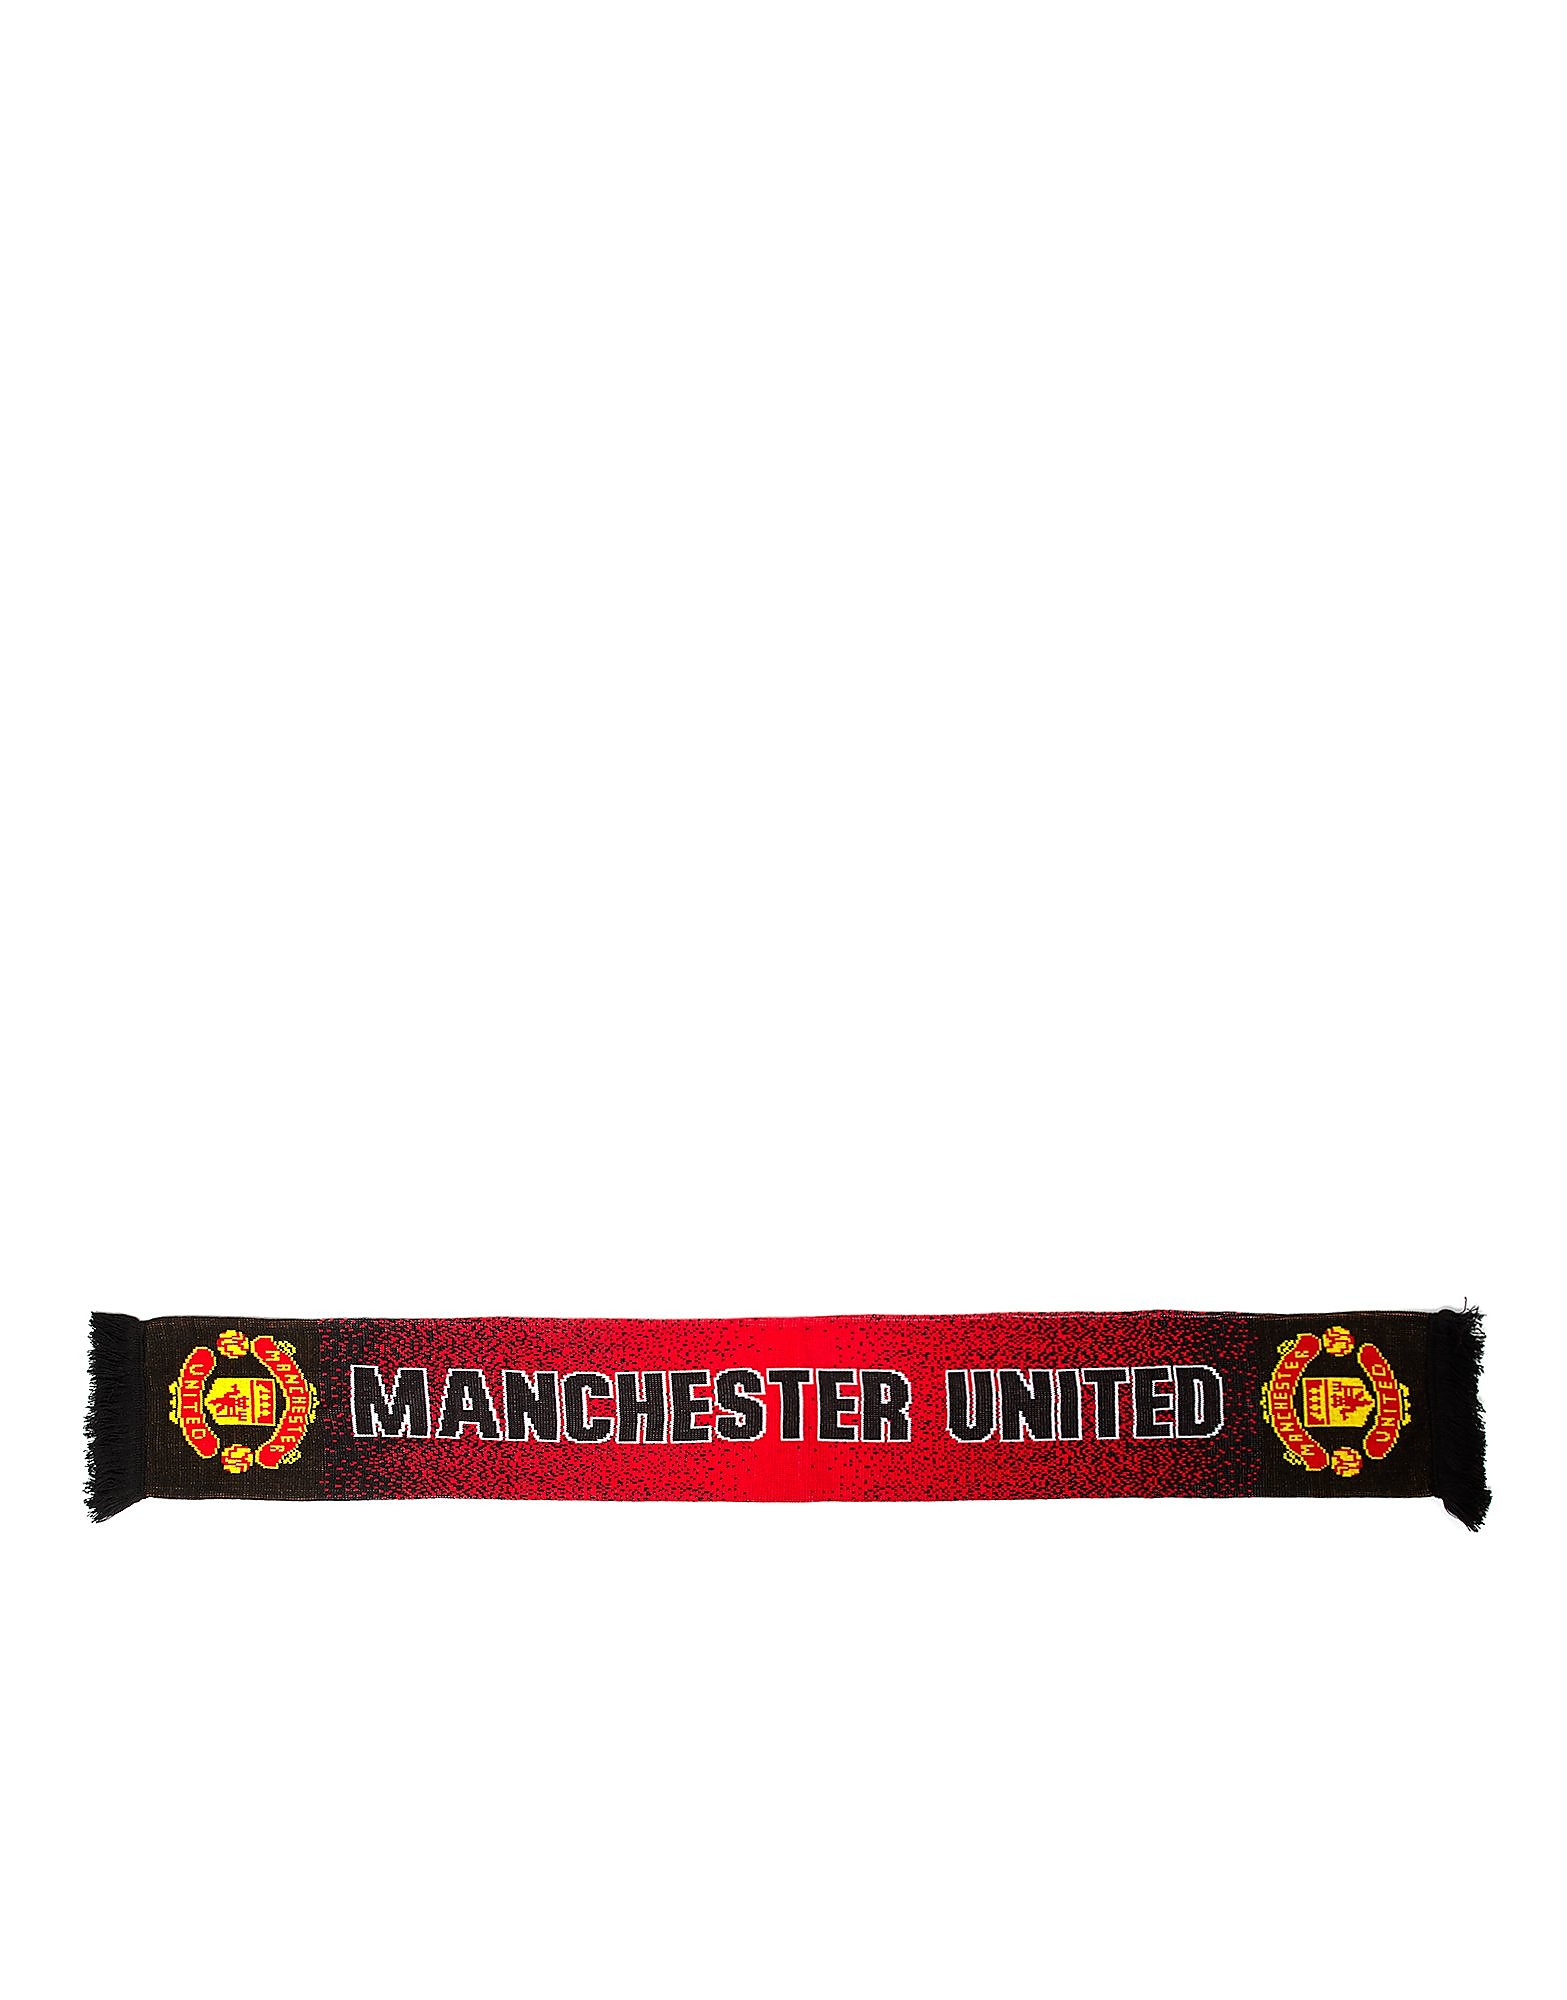 Brooks Jordan Manchester United FC Speckle Scarf